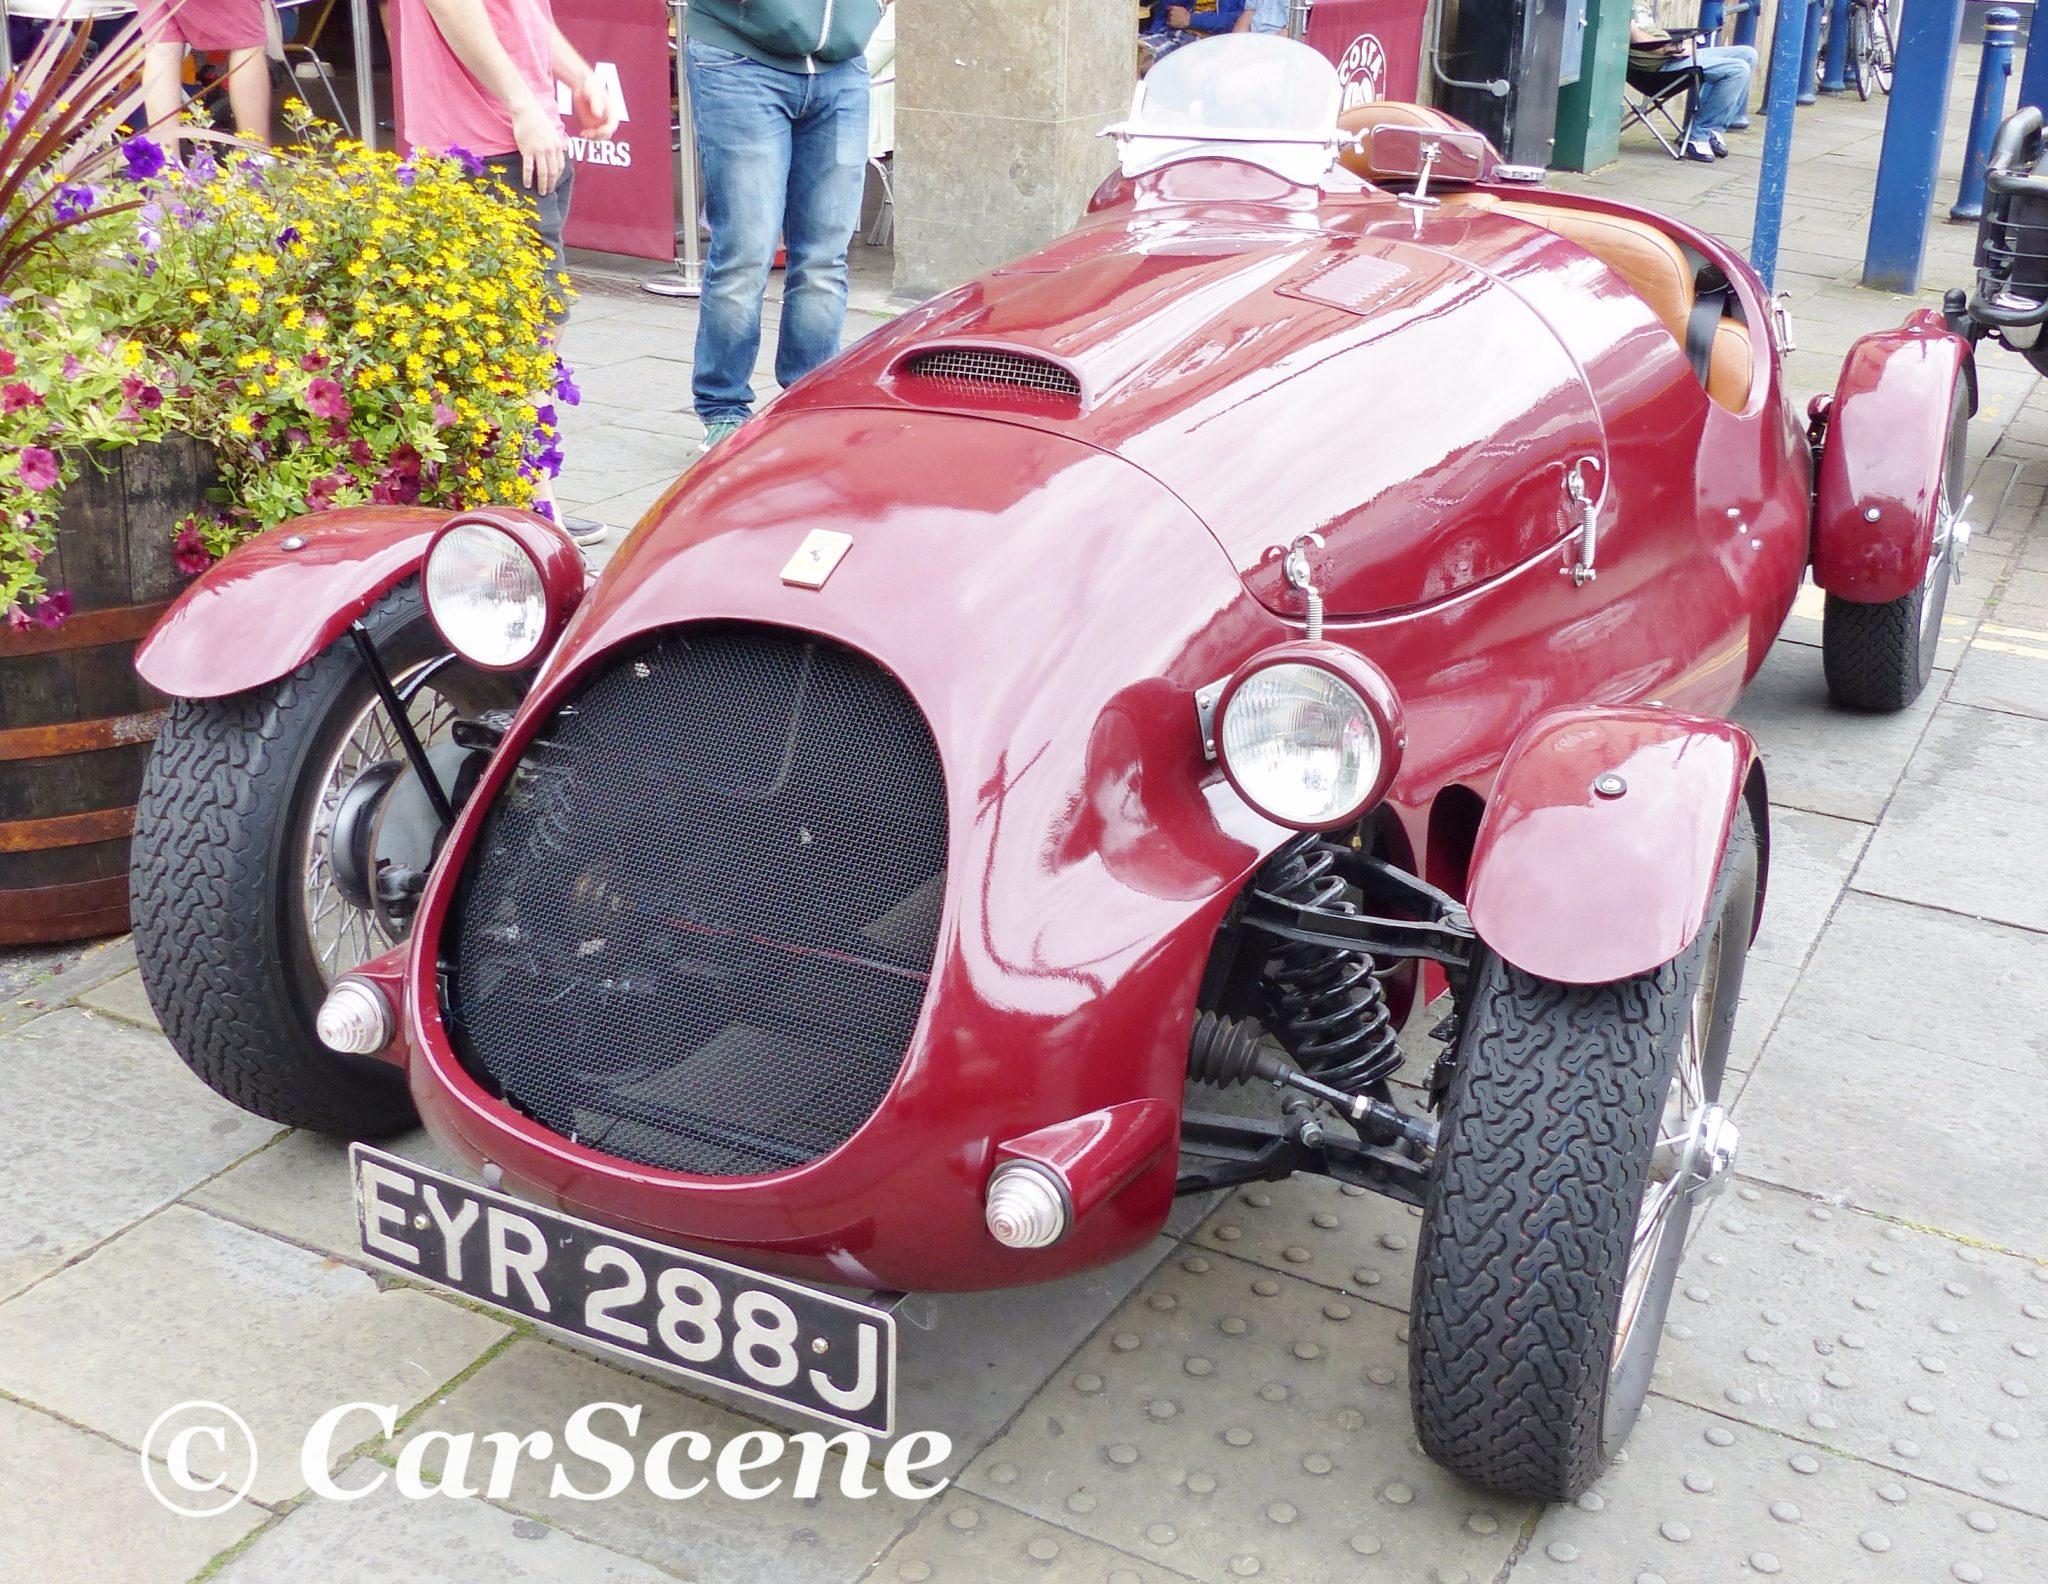 Warwick Classic Car Show - 12th August 2018 - Car Scene